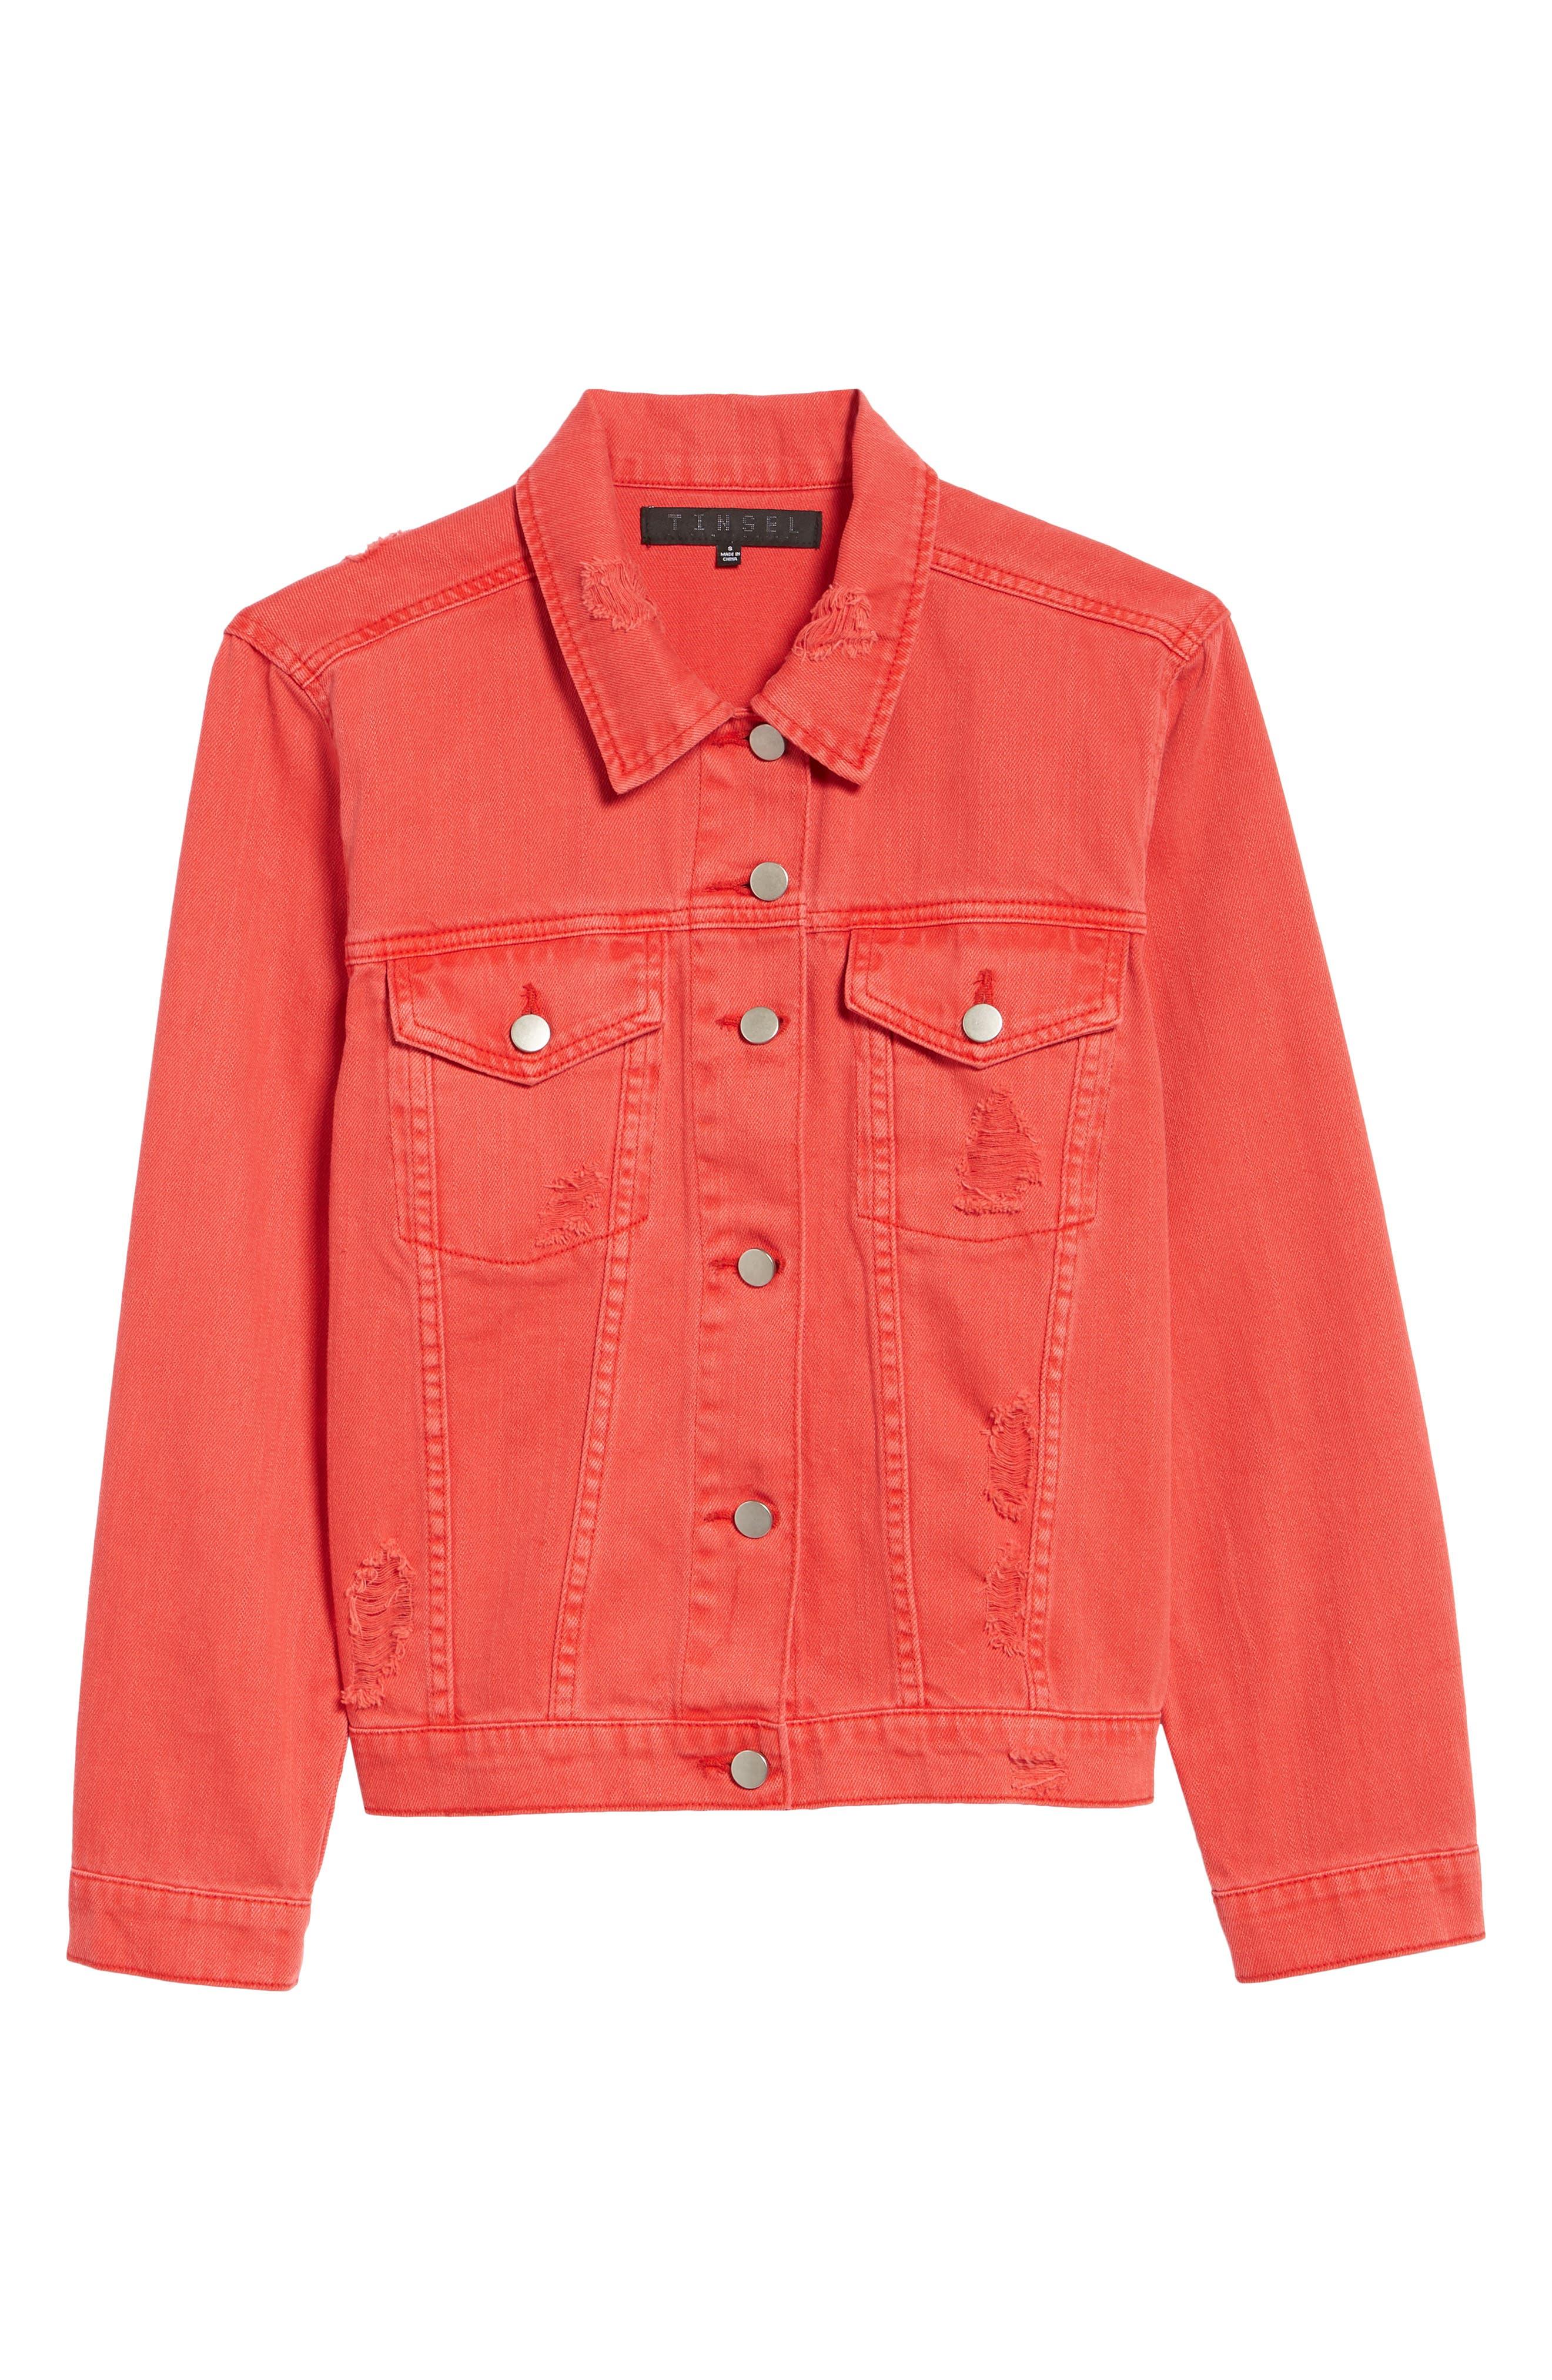 Decon Distressed Denim Jacket,                             Alternate thumbnail 6, color,